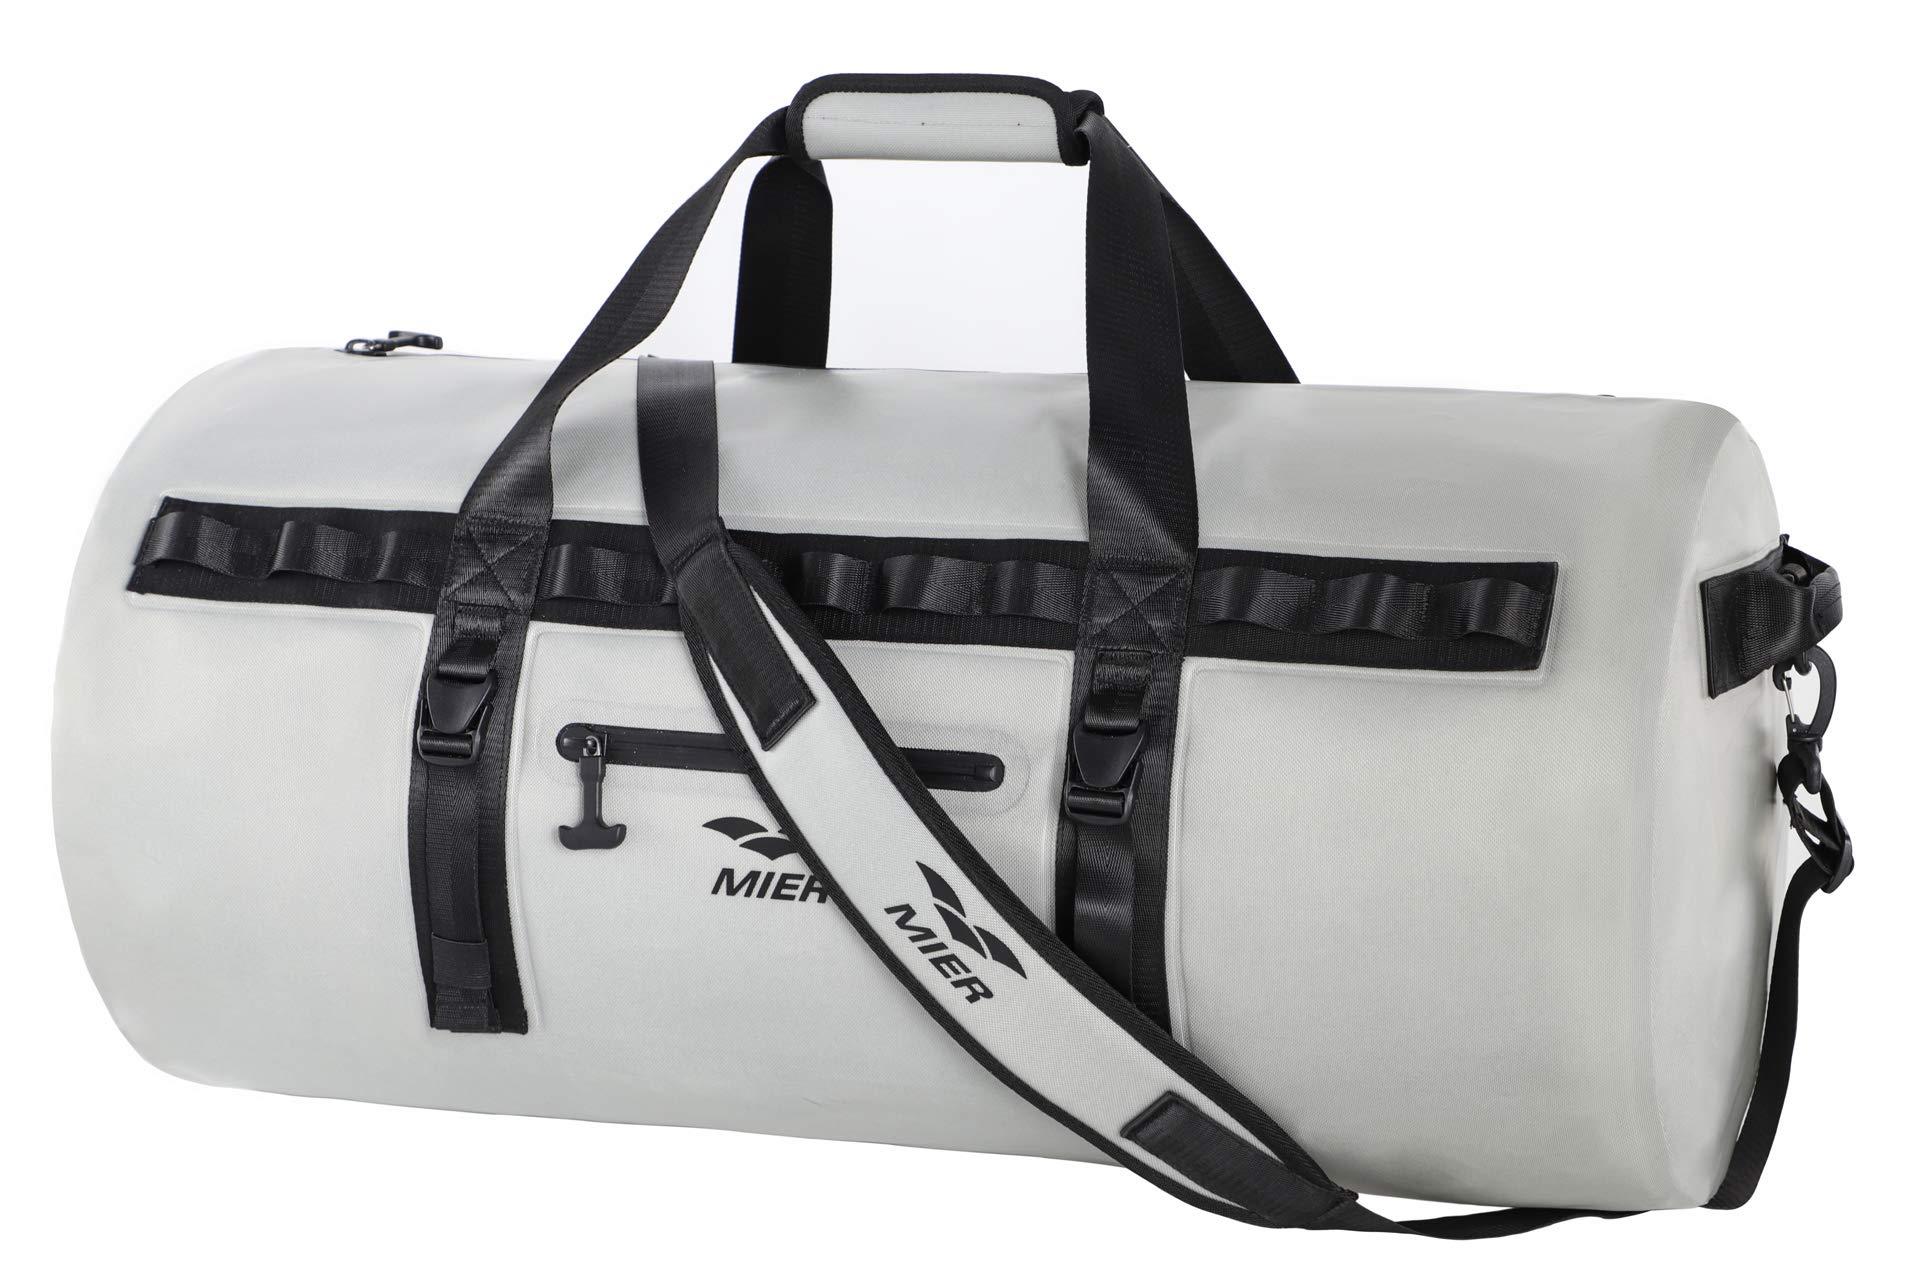 MIER Waterproof Dry Duffel Bag Airtight TPU Dry Bag for Motorcycle, Kayaking, Rafting, Skiing, Travel, Hiking, Camping, 70L/90L, Grey